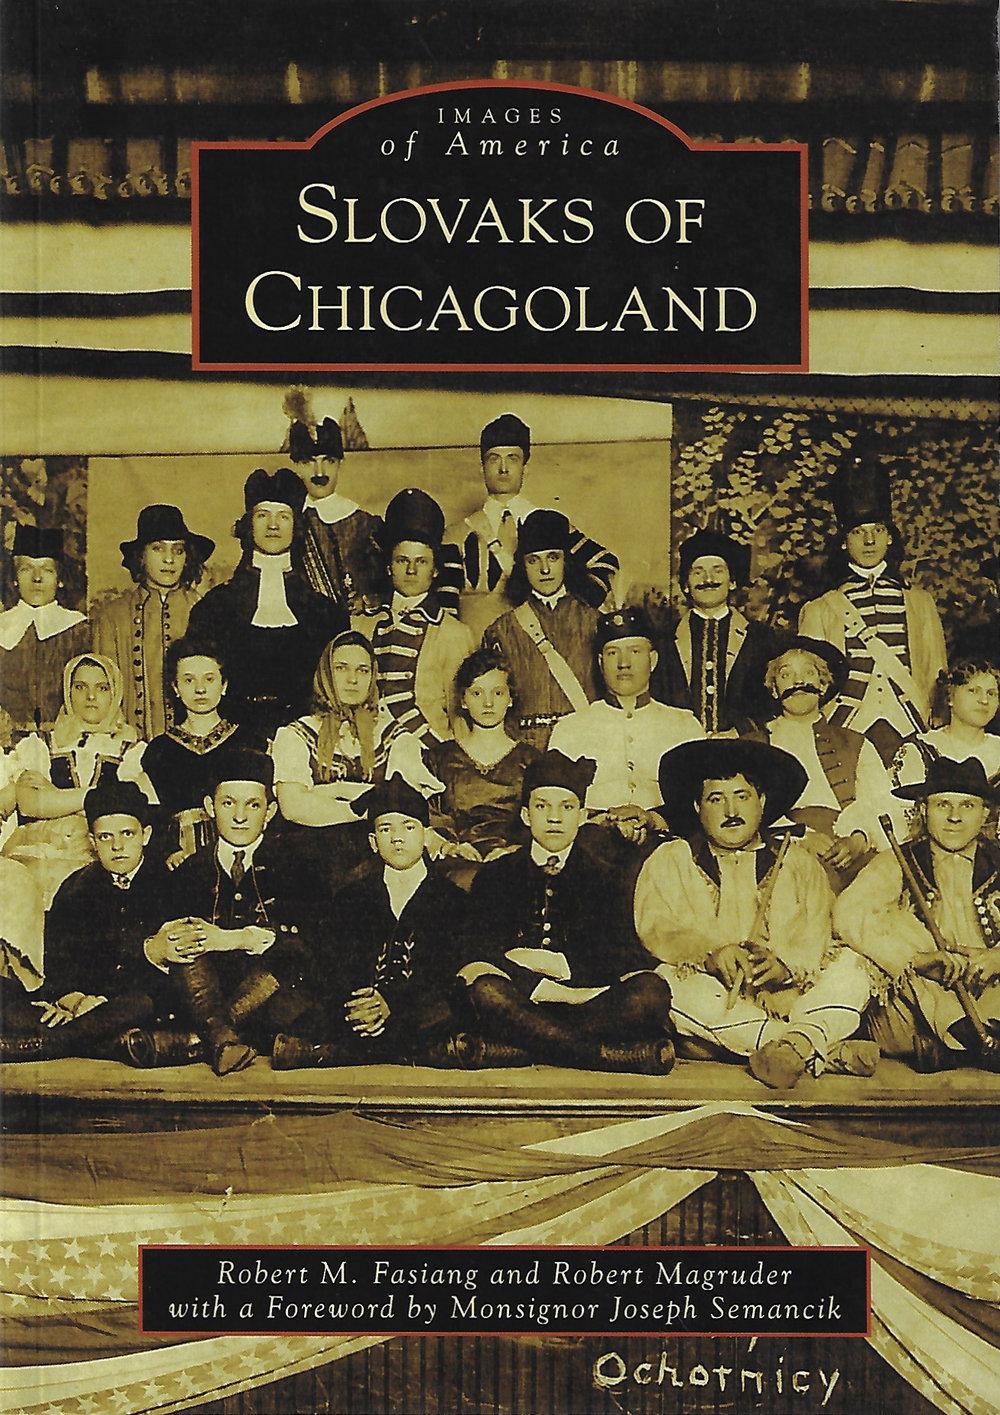 Slovak of Chicagoland by Robert M. Fasiang & Robert Magruder, 2014